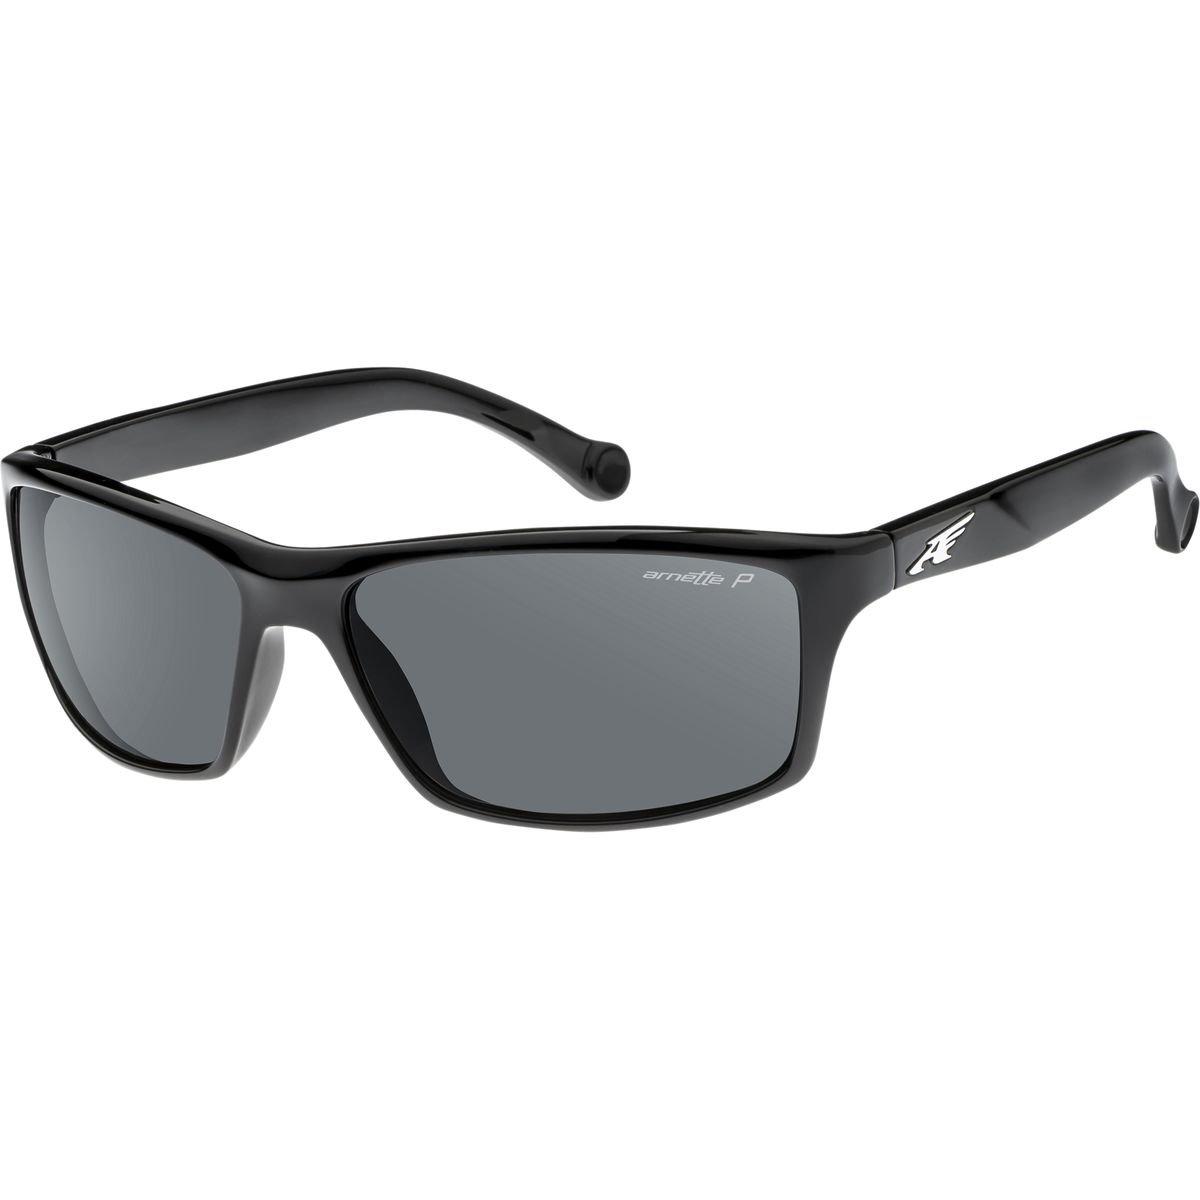 TALLA 41. Arnette Sonnenbrille BOILER (AN4207)